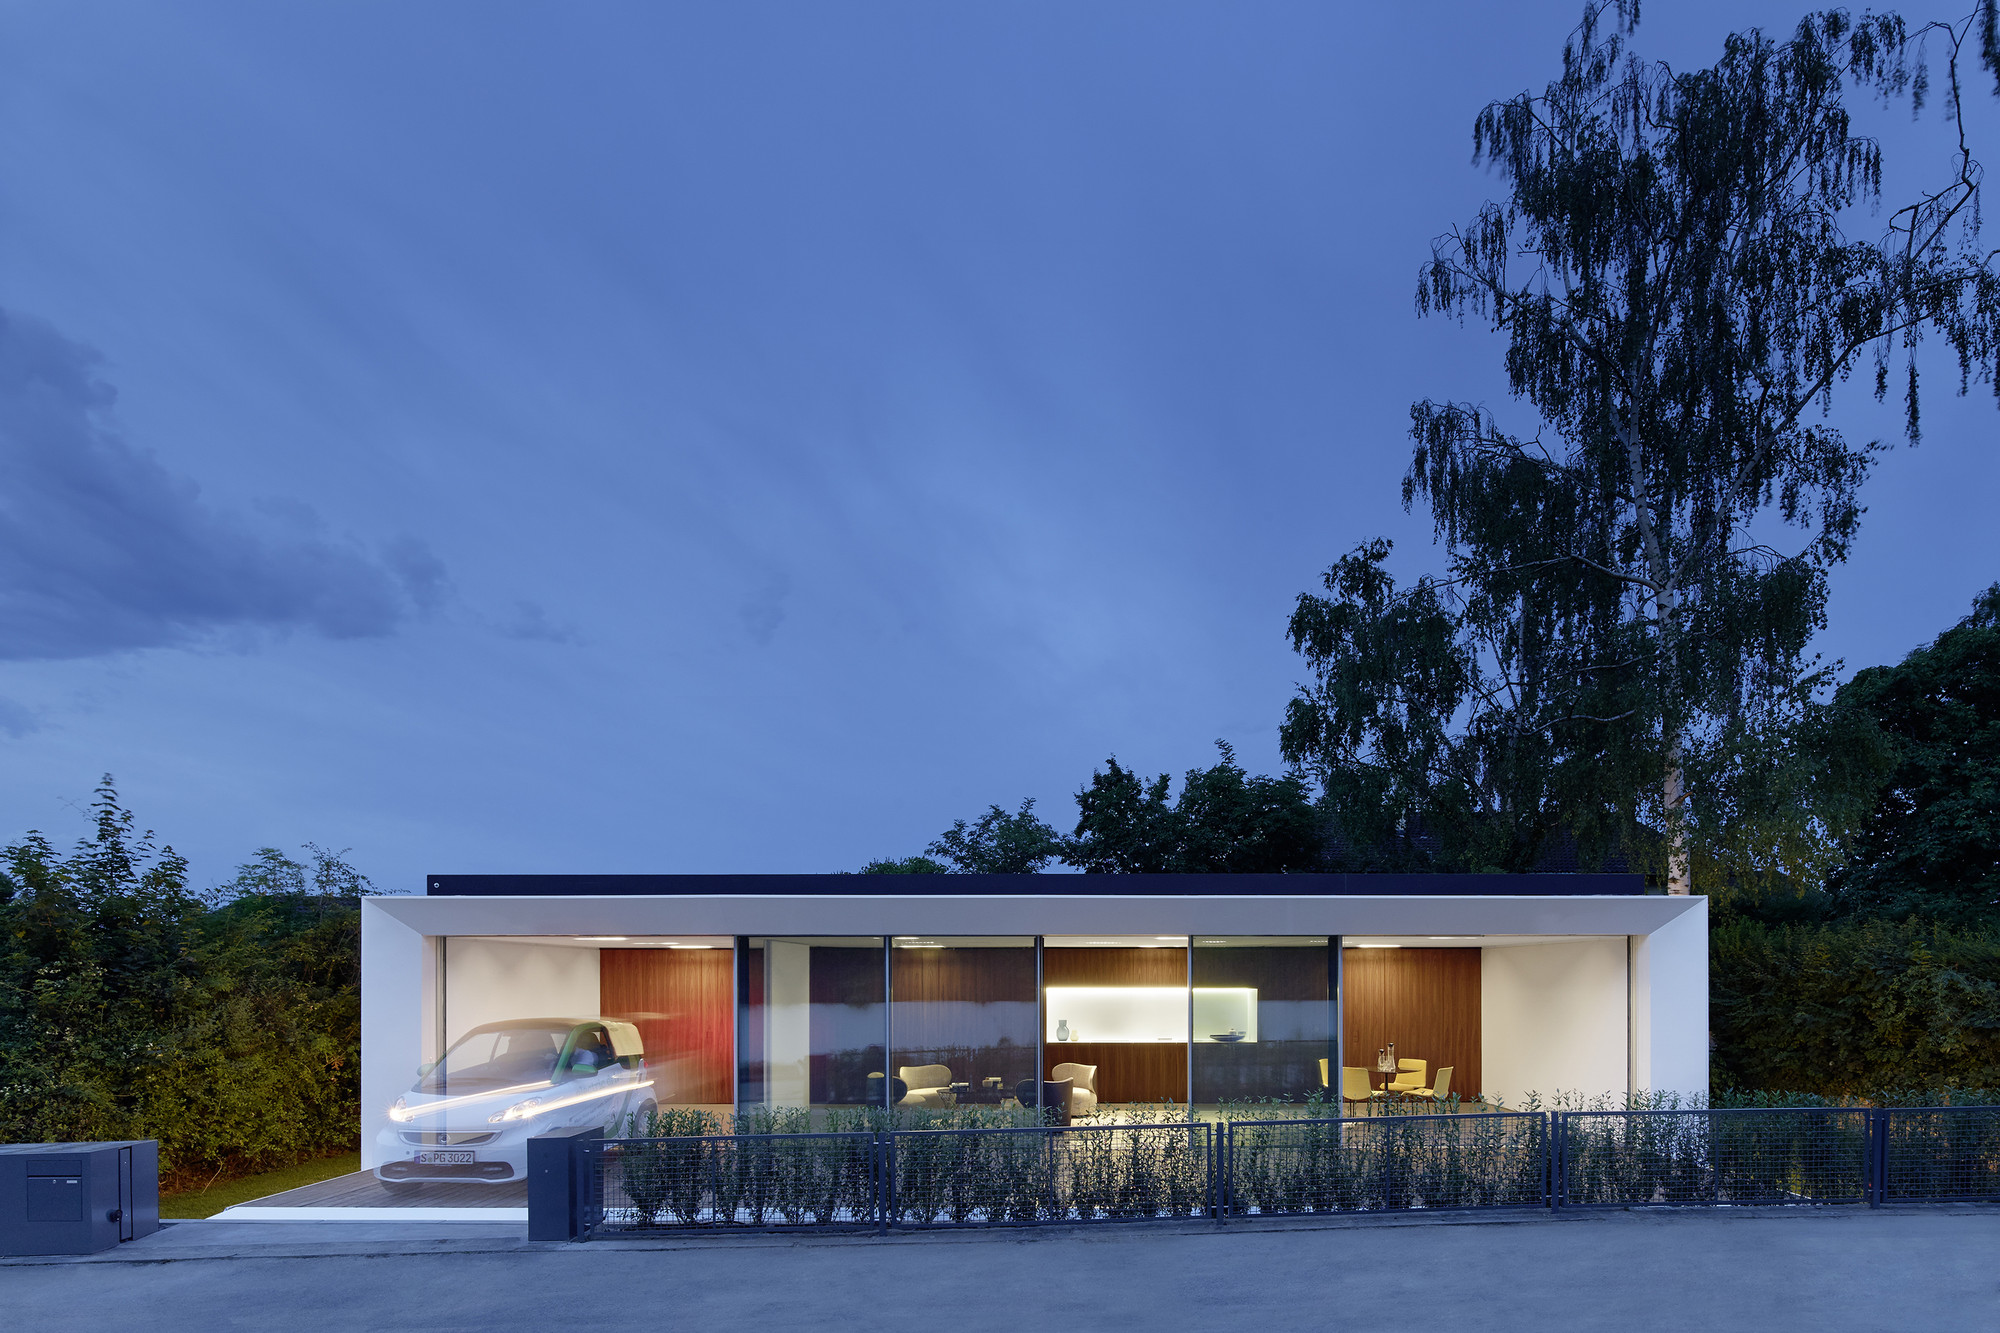 House B10 / Werner Sobek Group, © Zooey Braun